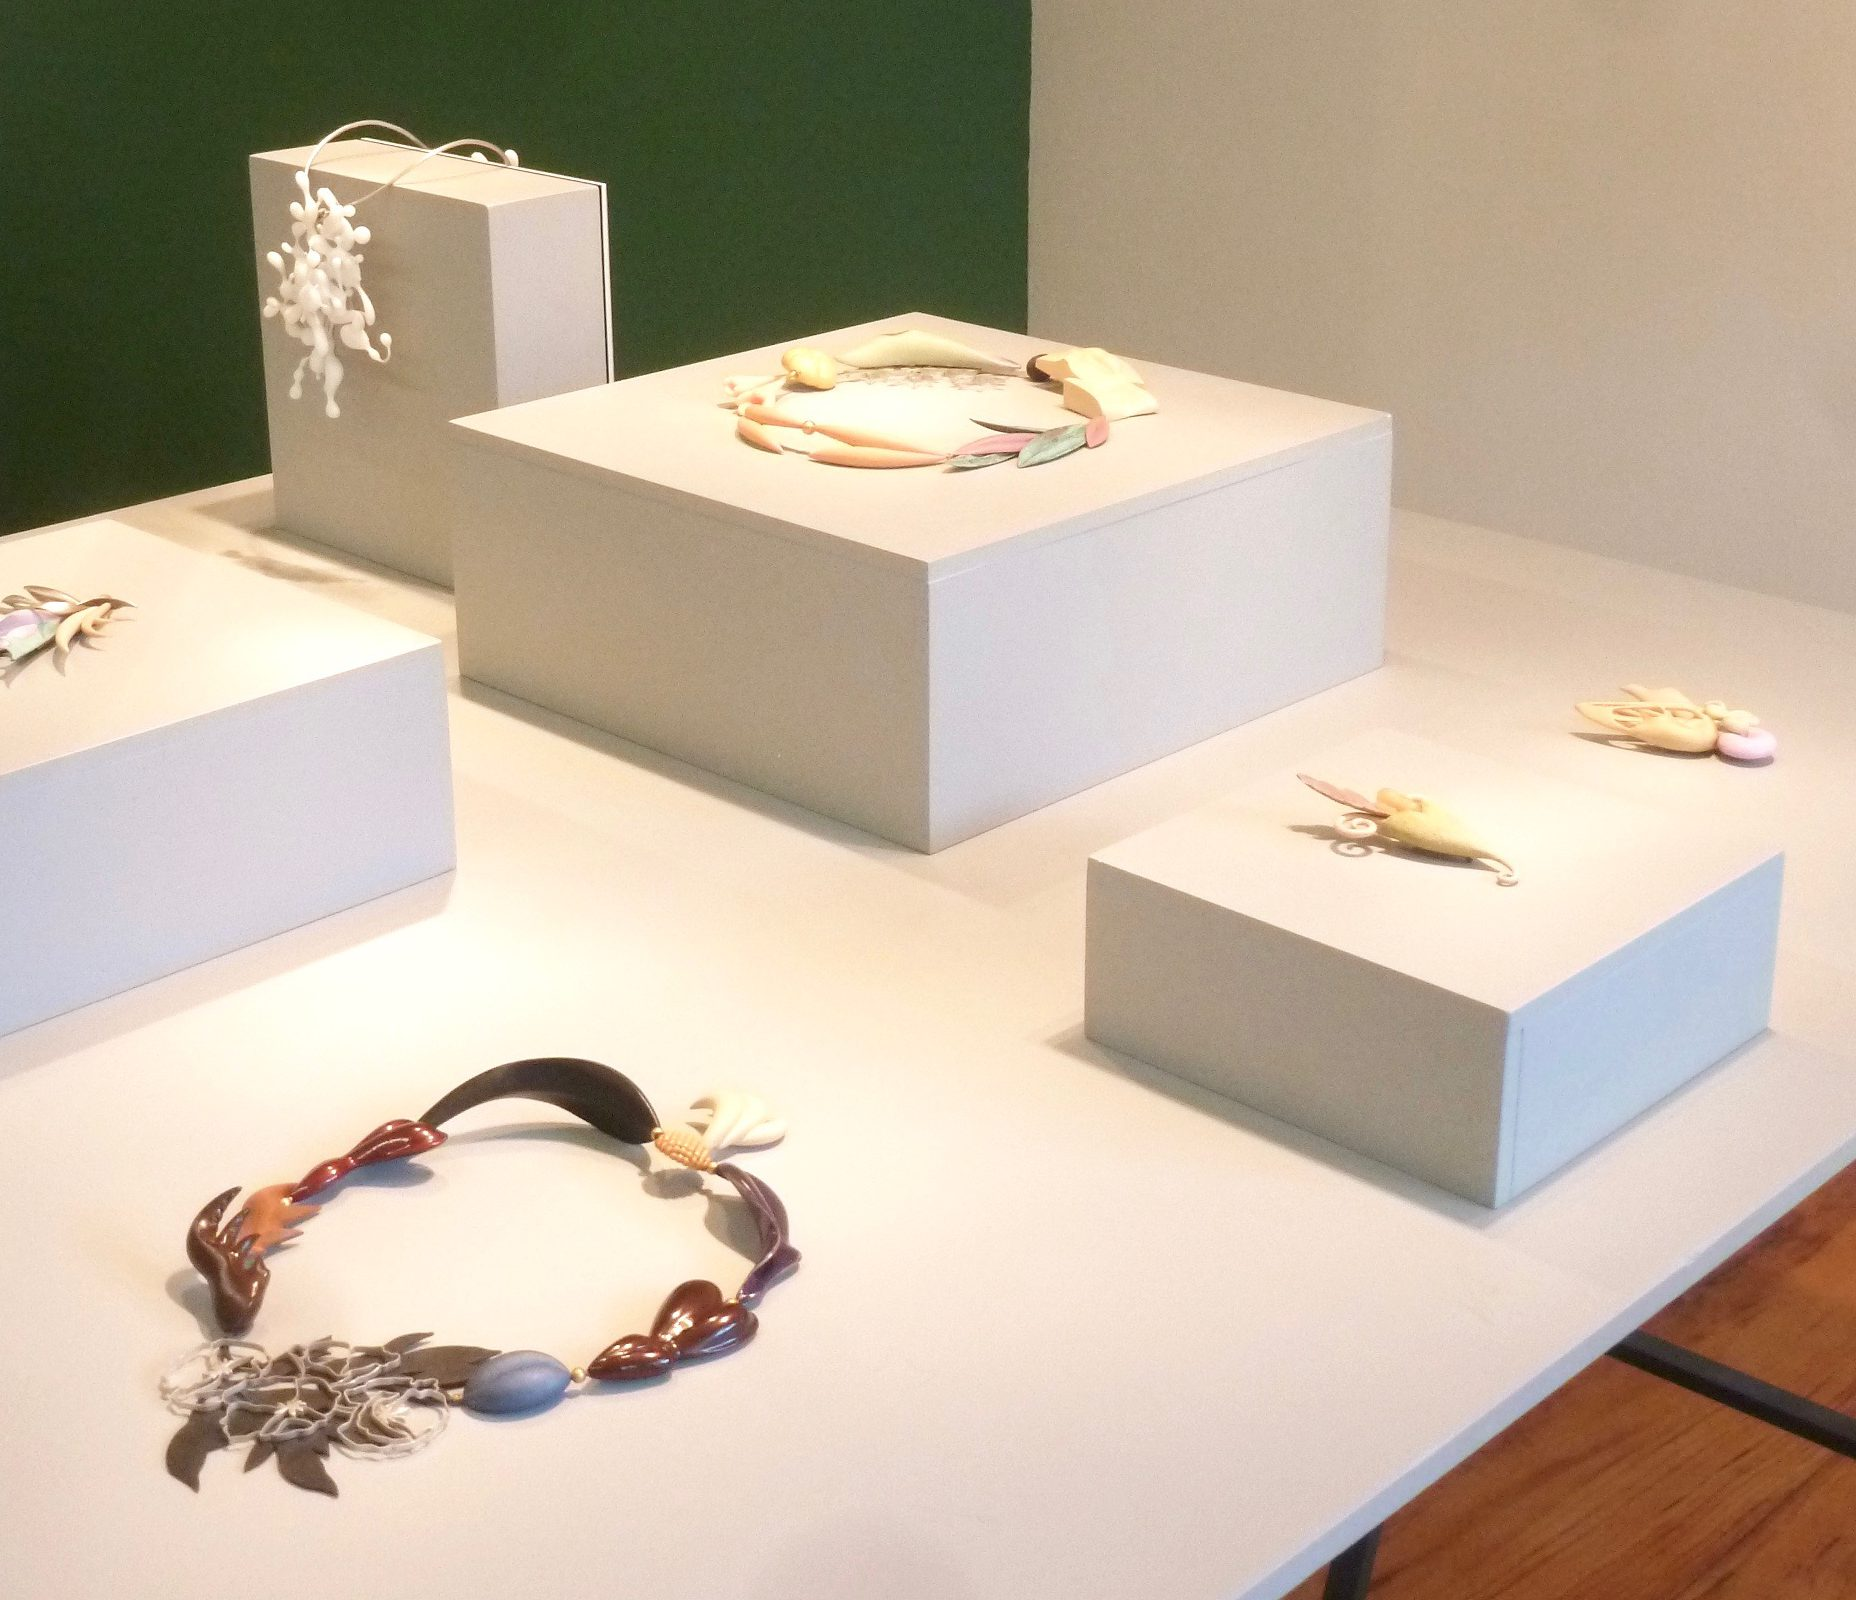 Bruce Metcalf, Sediment of Eros, Galerie Rob Koudijs, 2016, tentoonstelling